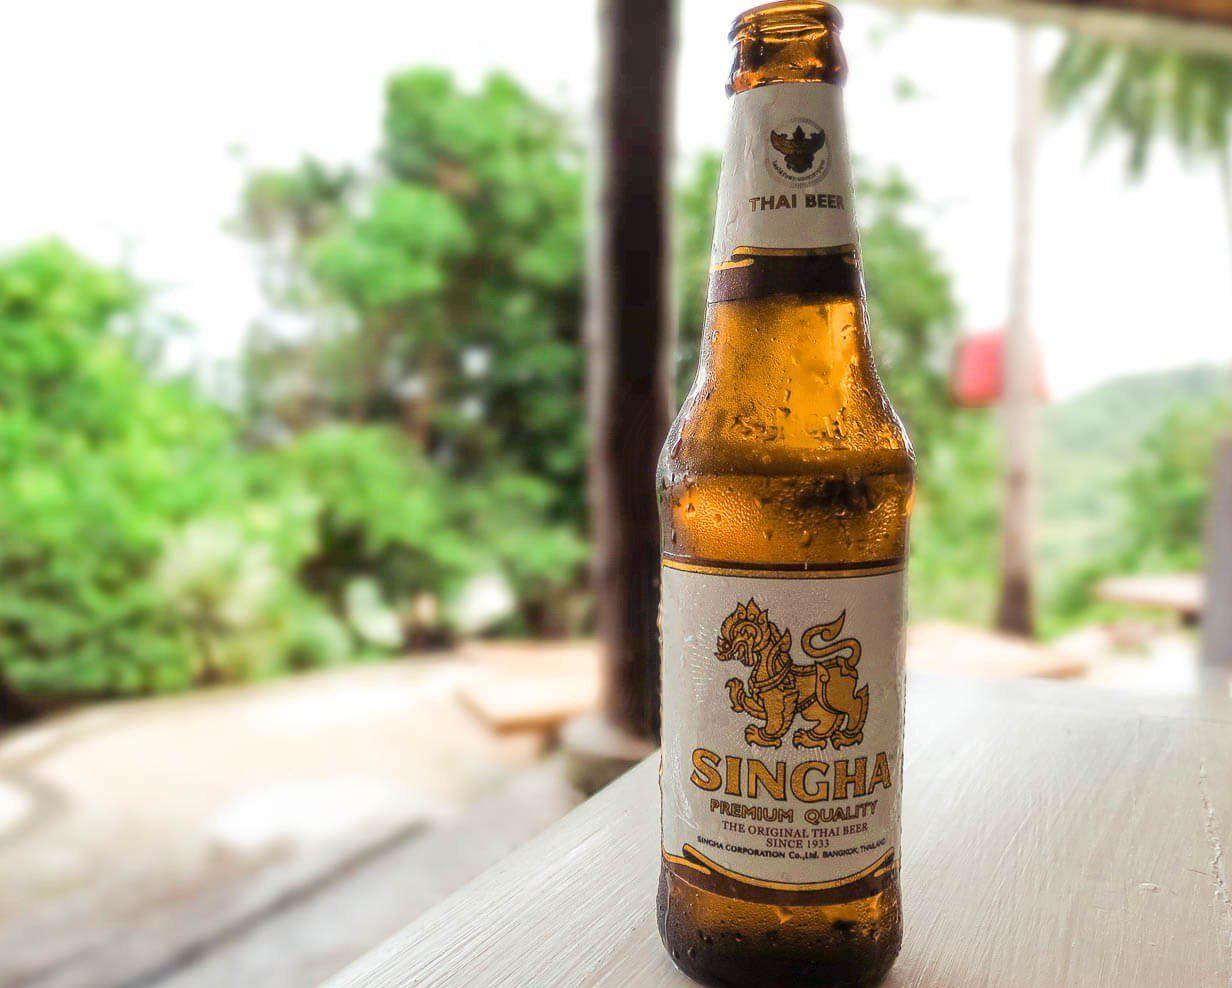 Рисовое вино в тайланде